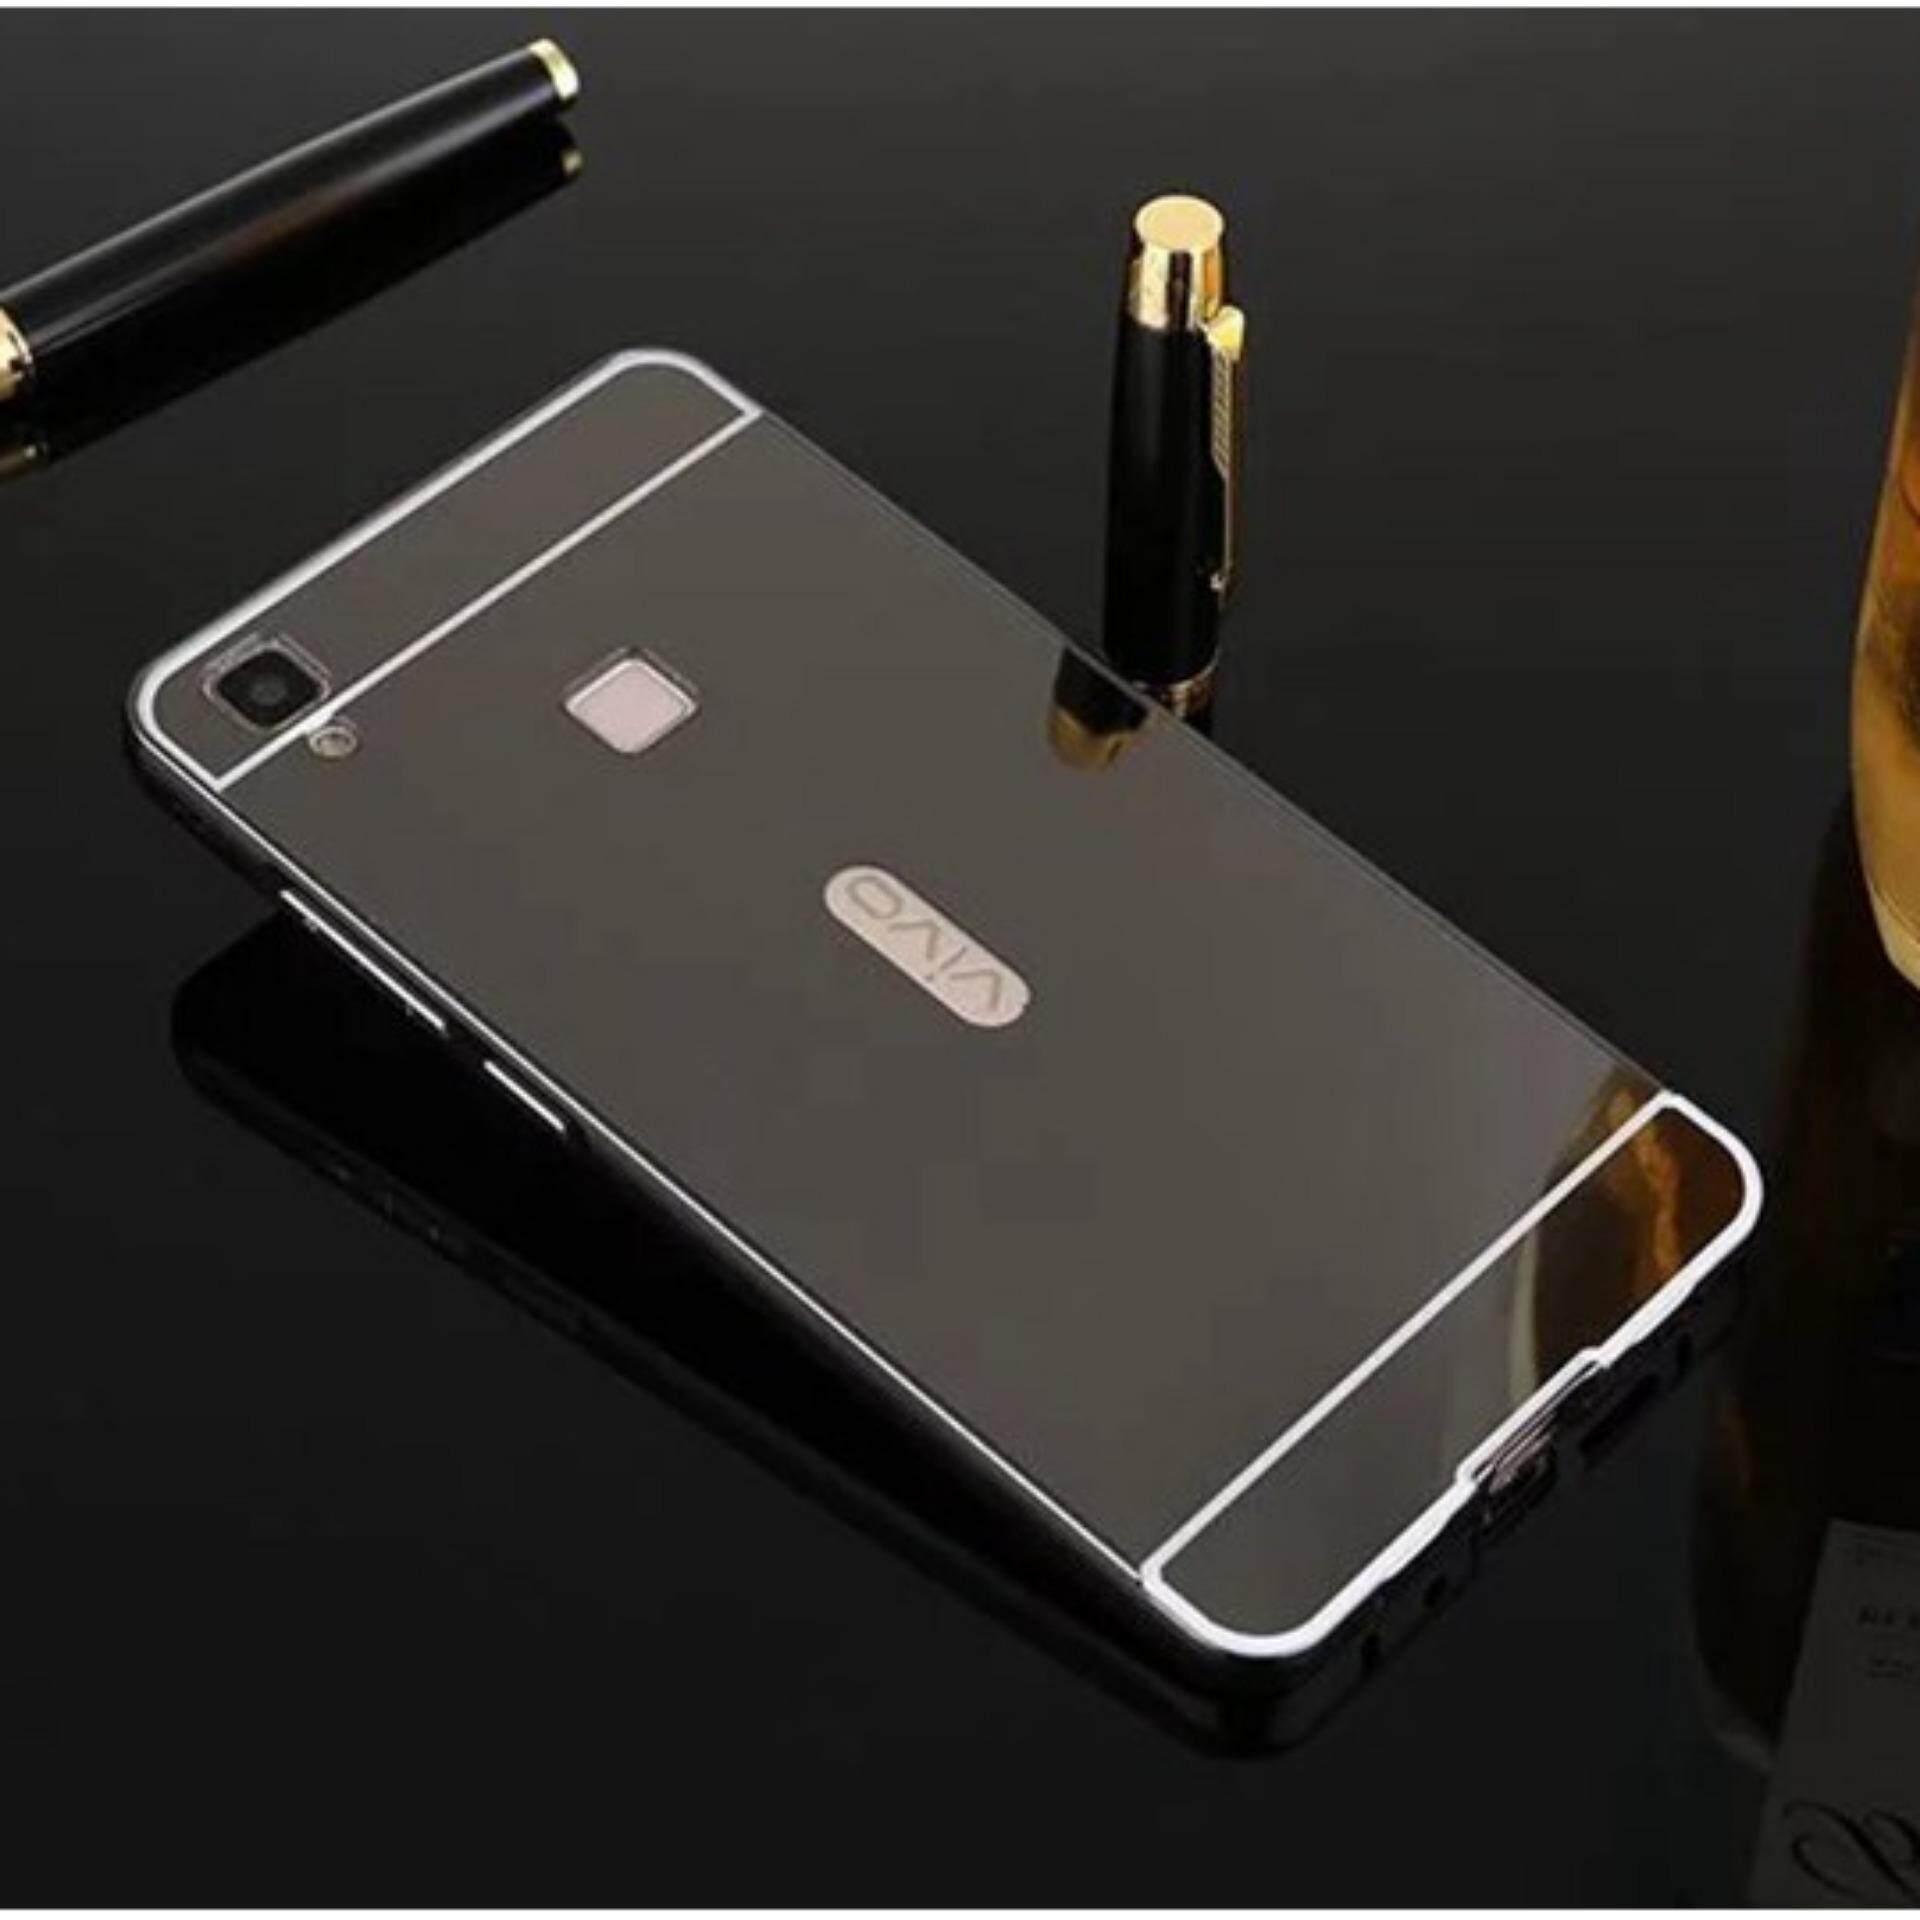 Elike For VIVO V3 Max Case 2 in 1 Plating Aluminum Frame Metal Mirror PC Hard Phone Cover - intl